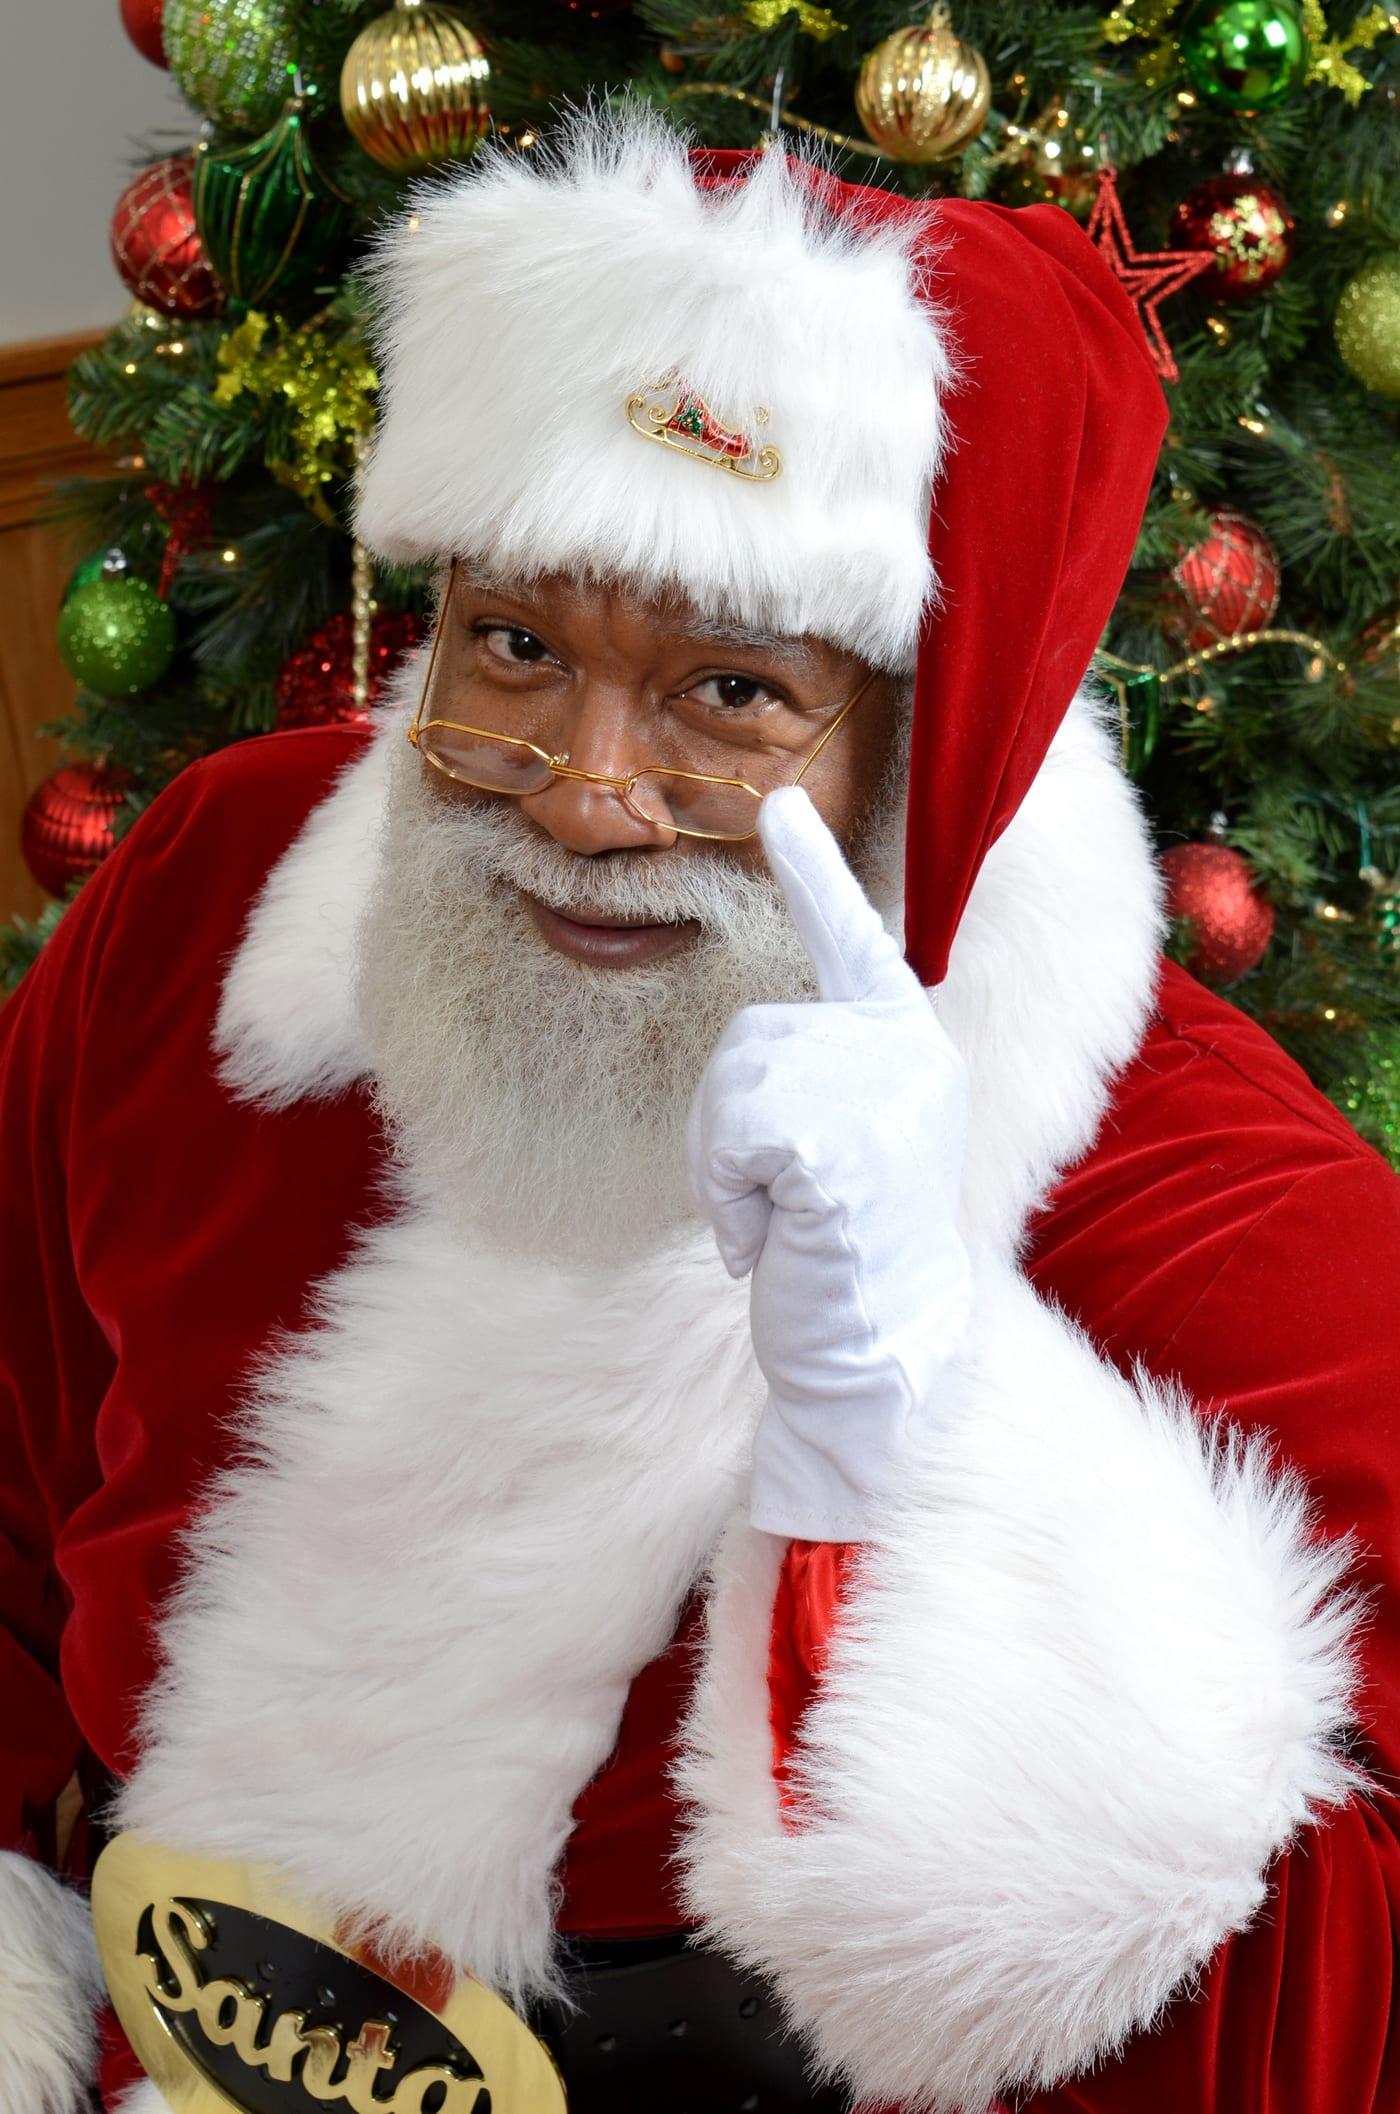 Despite the haters black santa thrives at mall of america